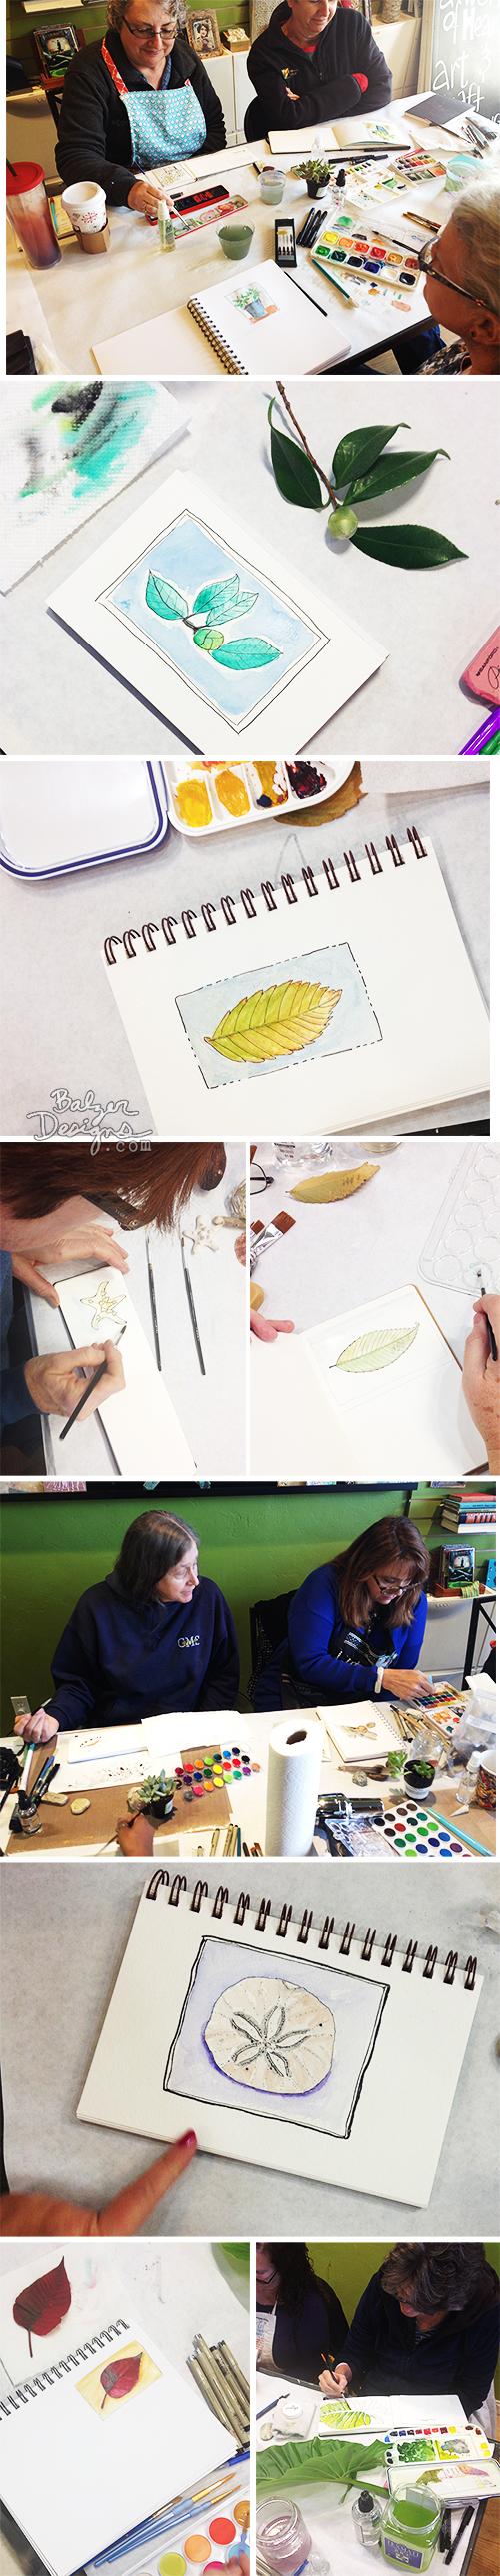 SketchingA-wm